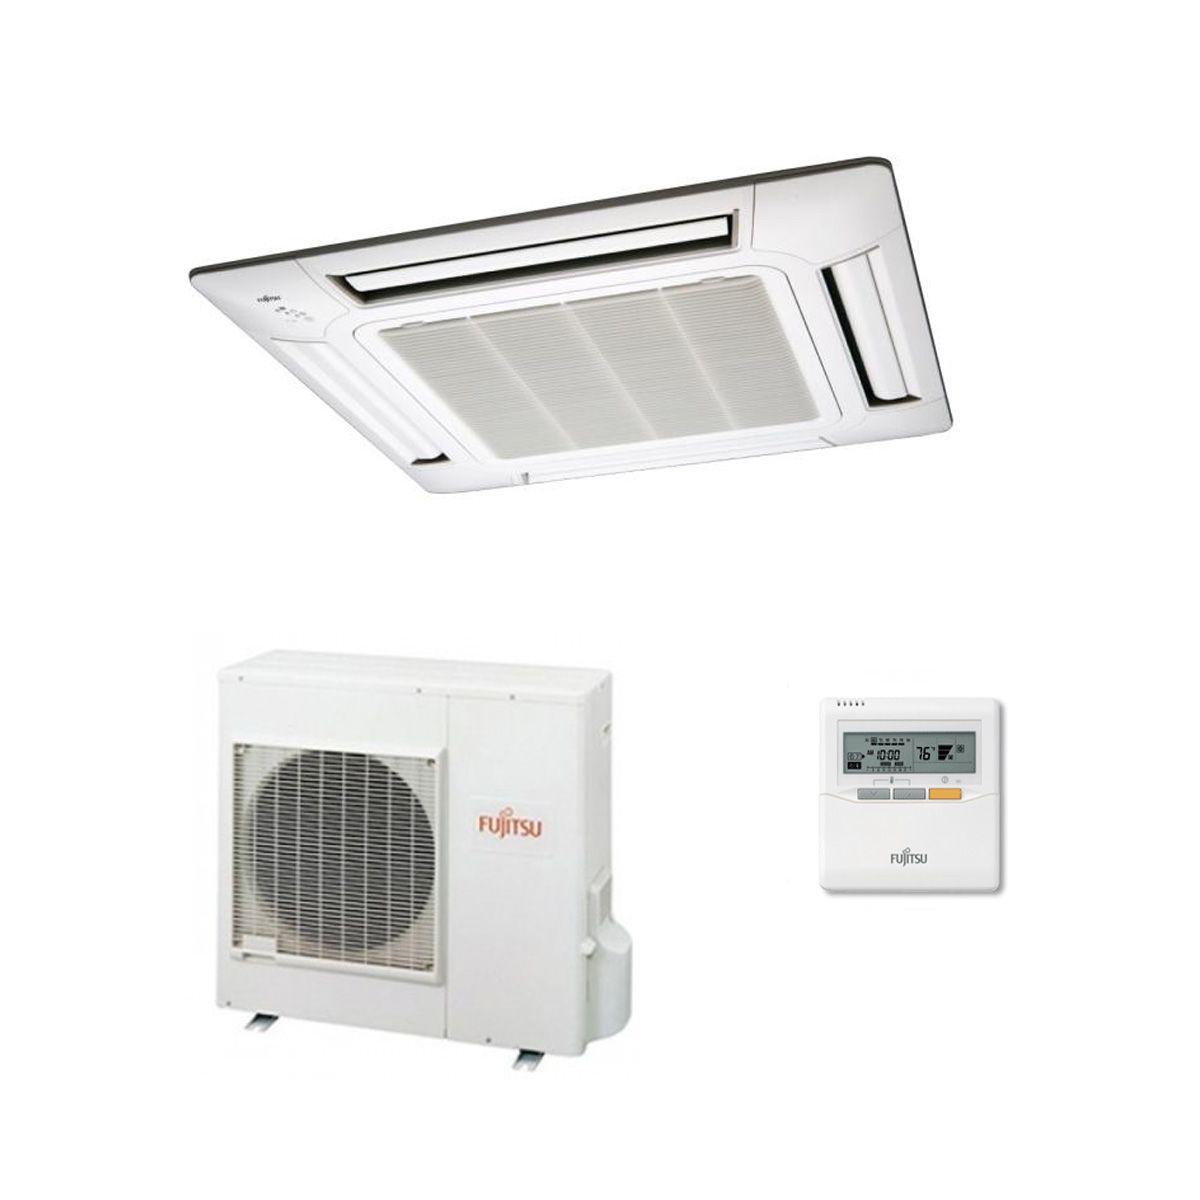 fujitsu air conditioning auyg30lrle 4-way flow cassette heat pump